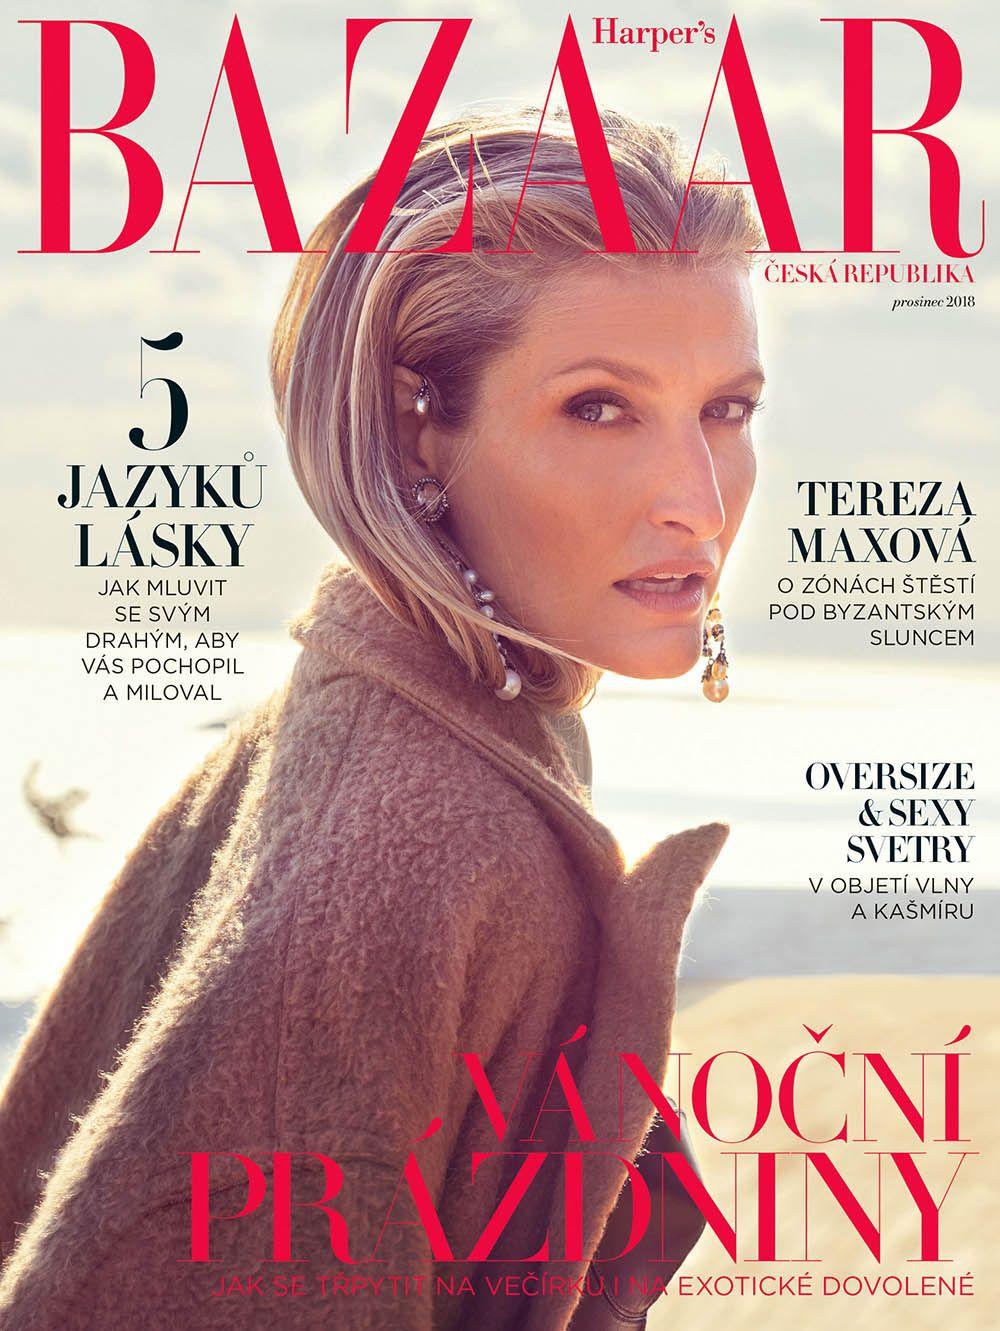 Tereza Maxova Covers Harper S Bazaar Czech December 2018 By Andreas Ortner Tapas Revistas